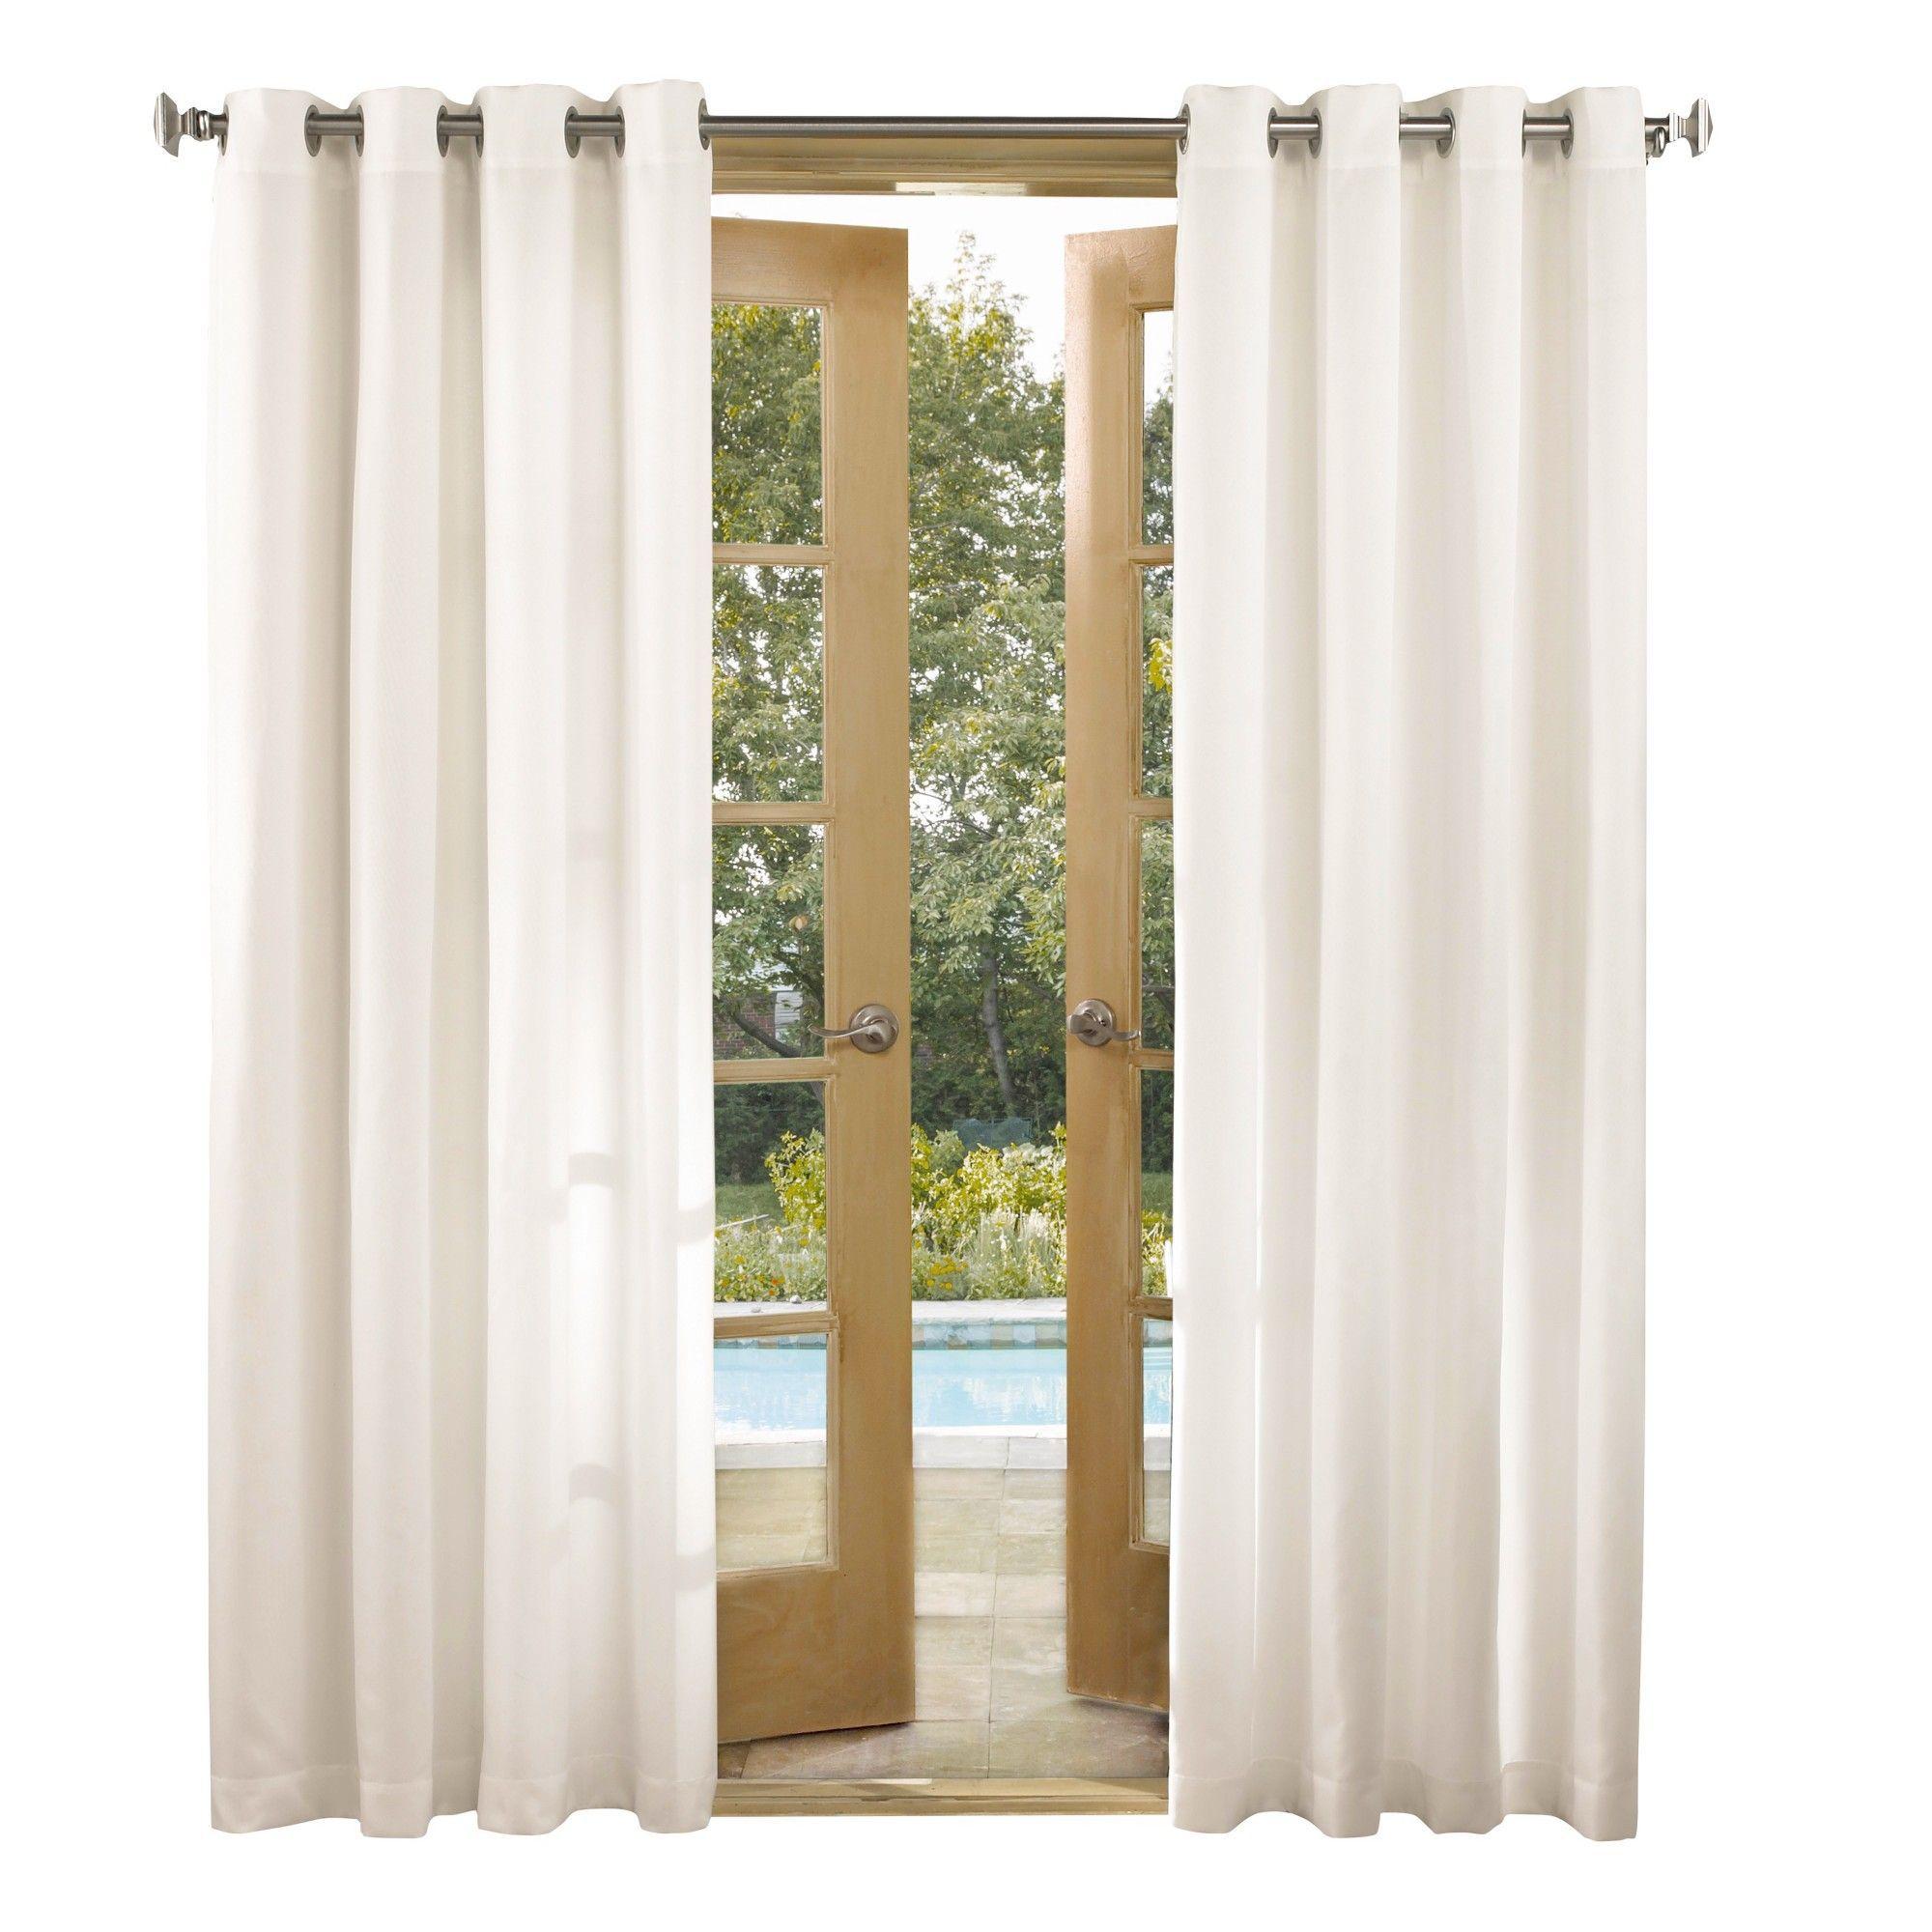 Rodham Indoor Outdoor Energy Efficient Uv Resistant Curtain Panel White 52 X95 Sun Zero Outdoor Curtains Indoor Outdoor Outdoor Curtains For Patio